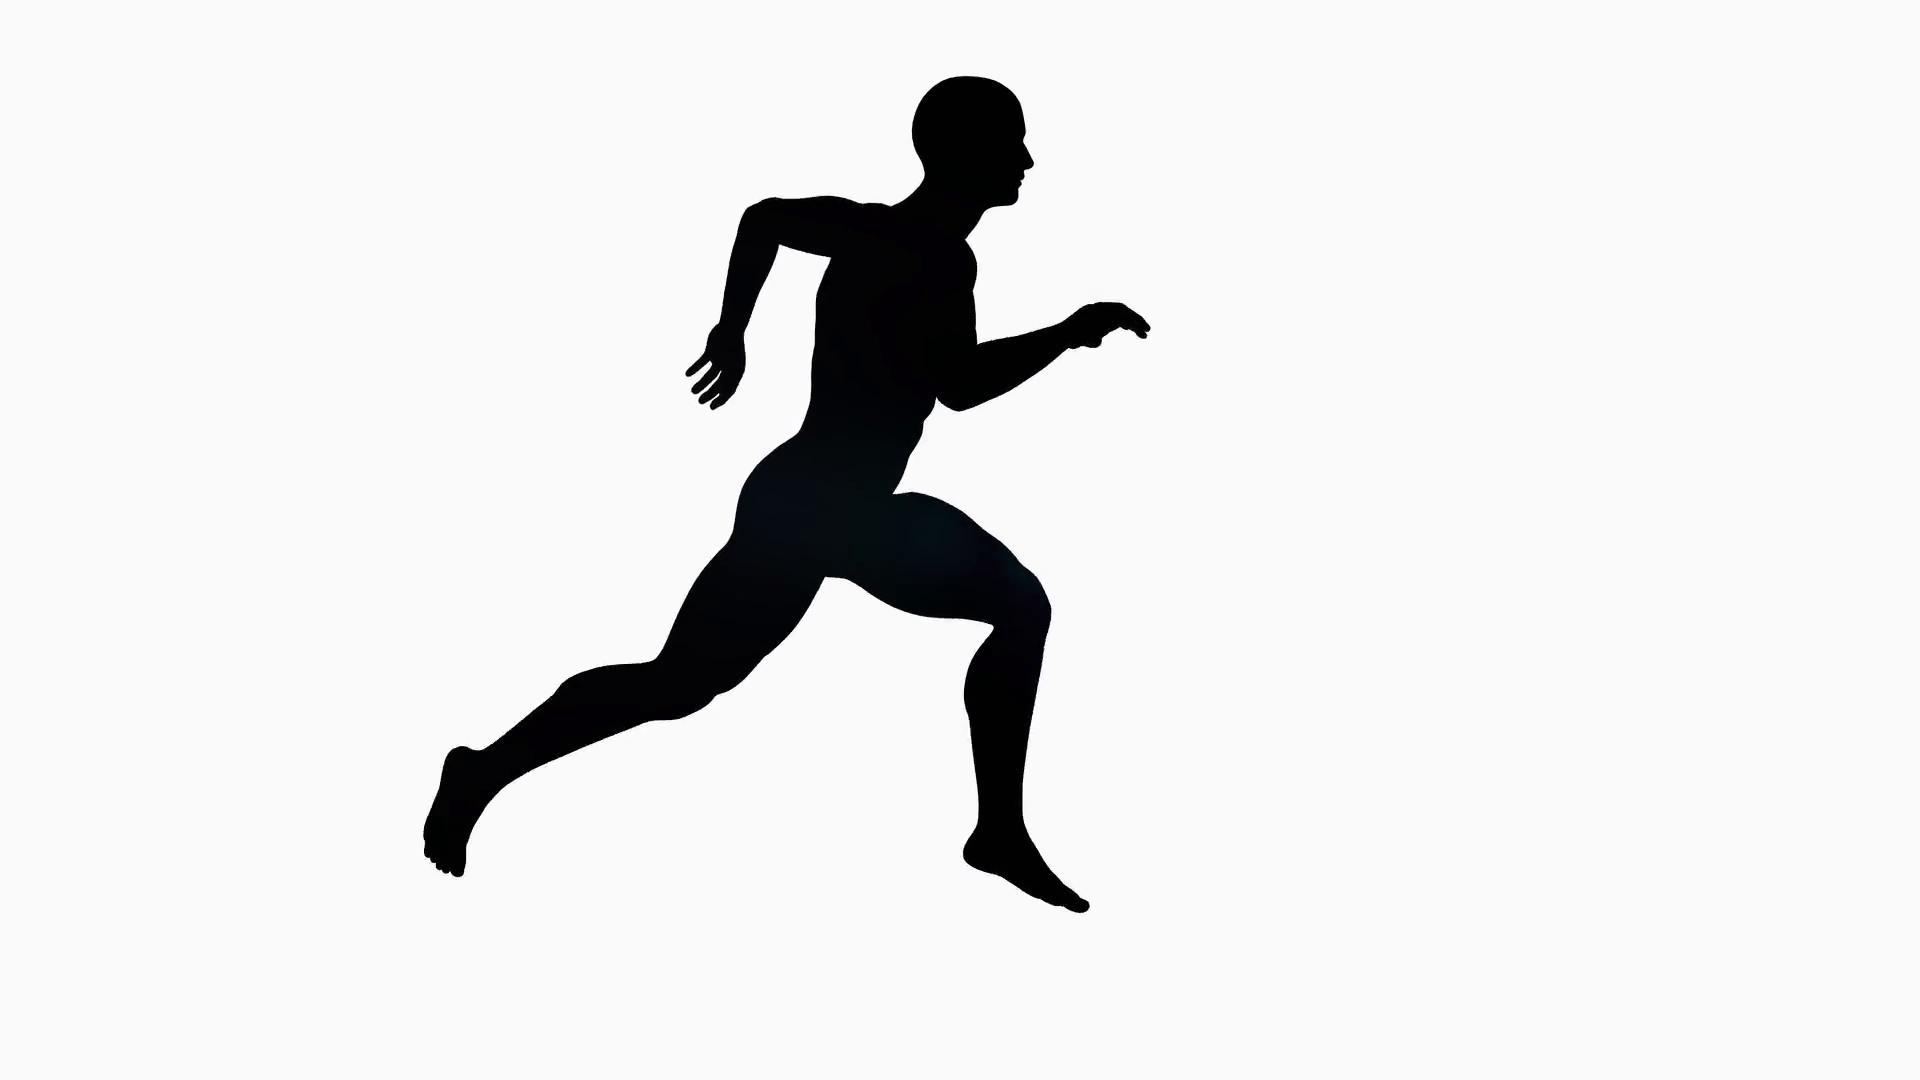 Silhouette Running Man At Getdrawings